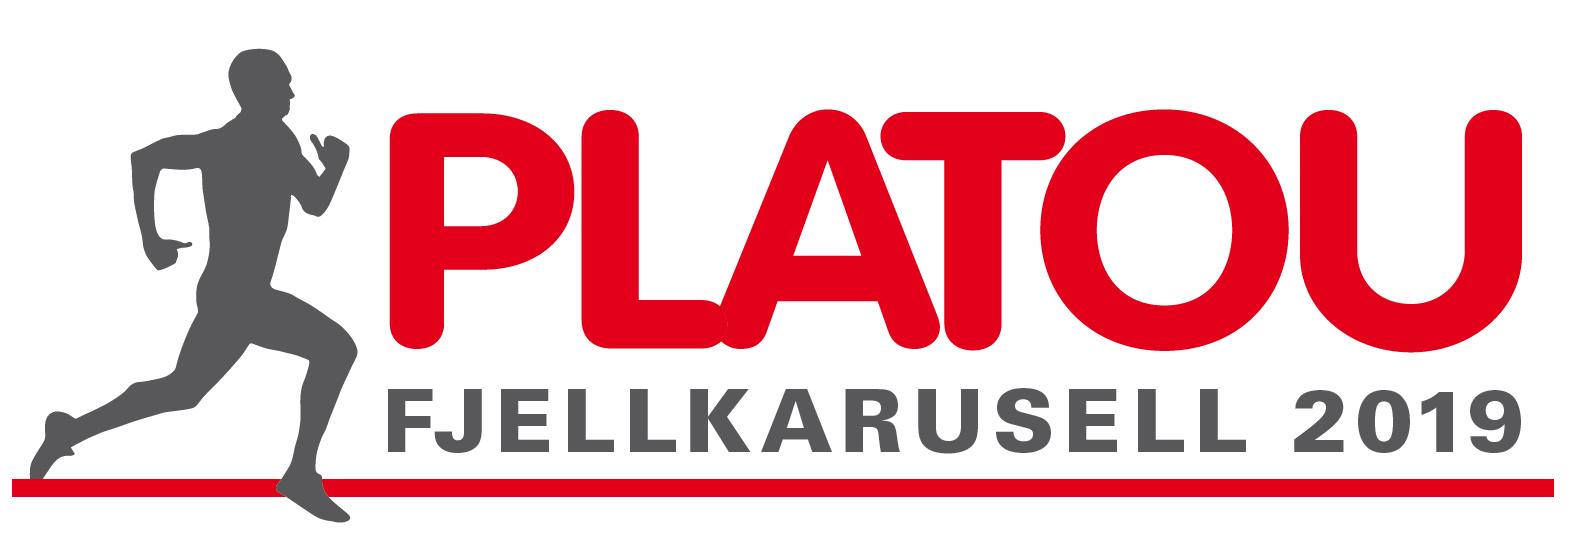 Logo Fjellkarusell 2019.jpg